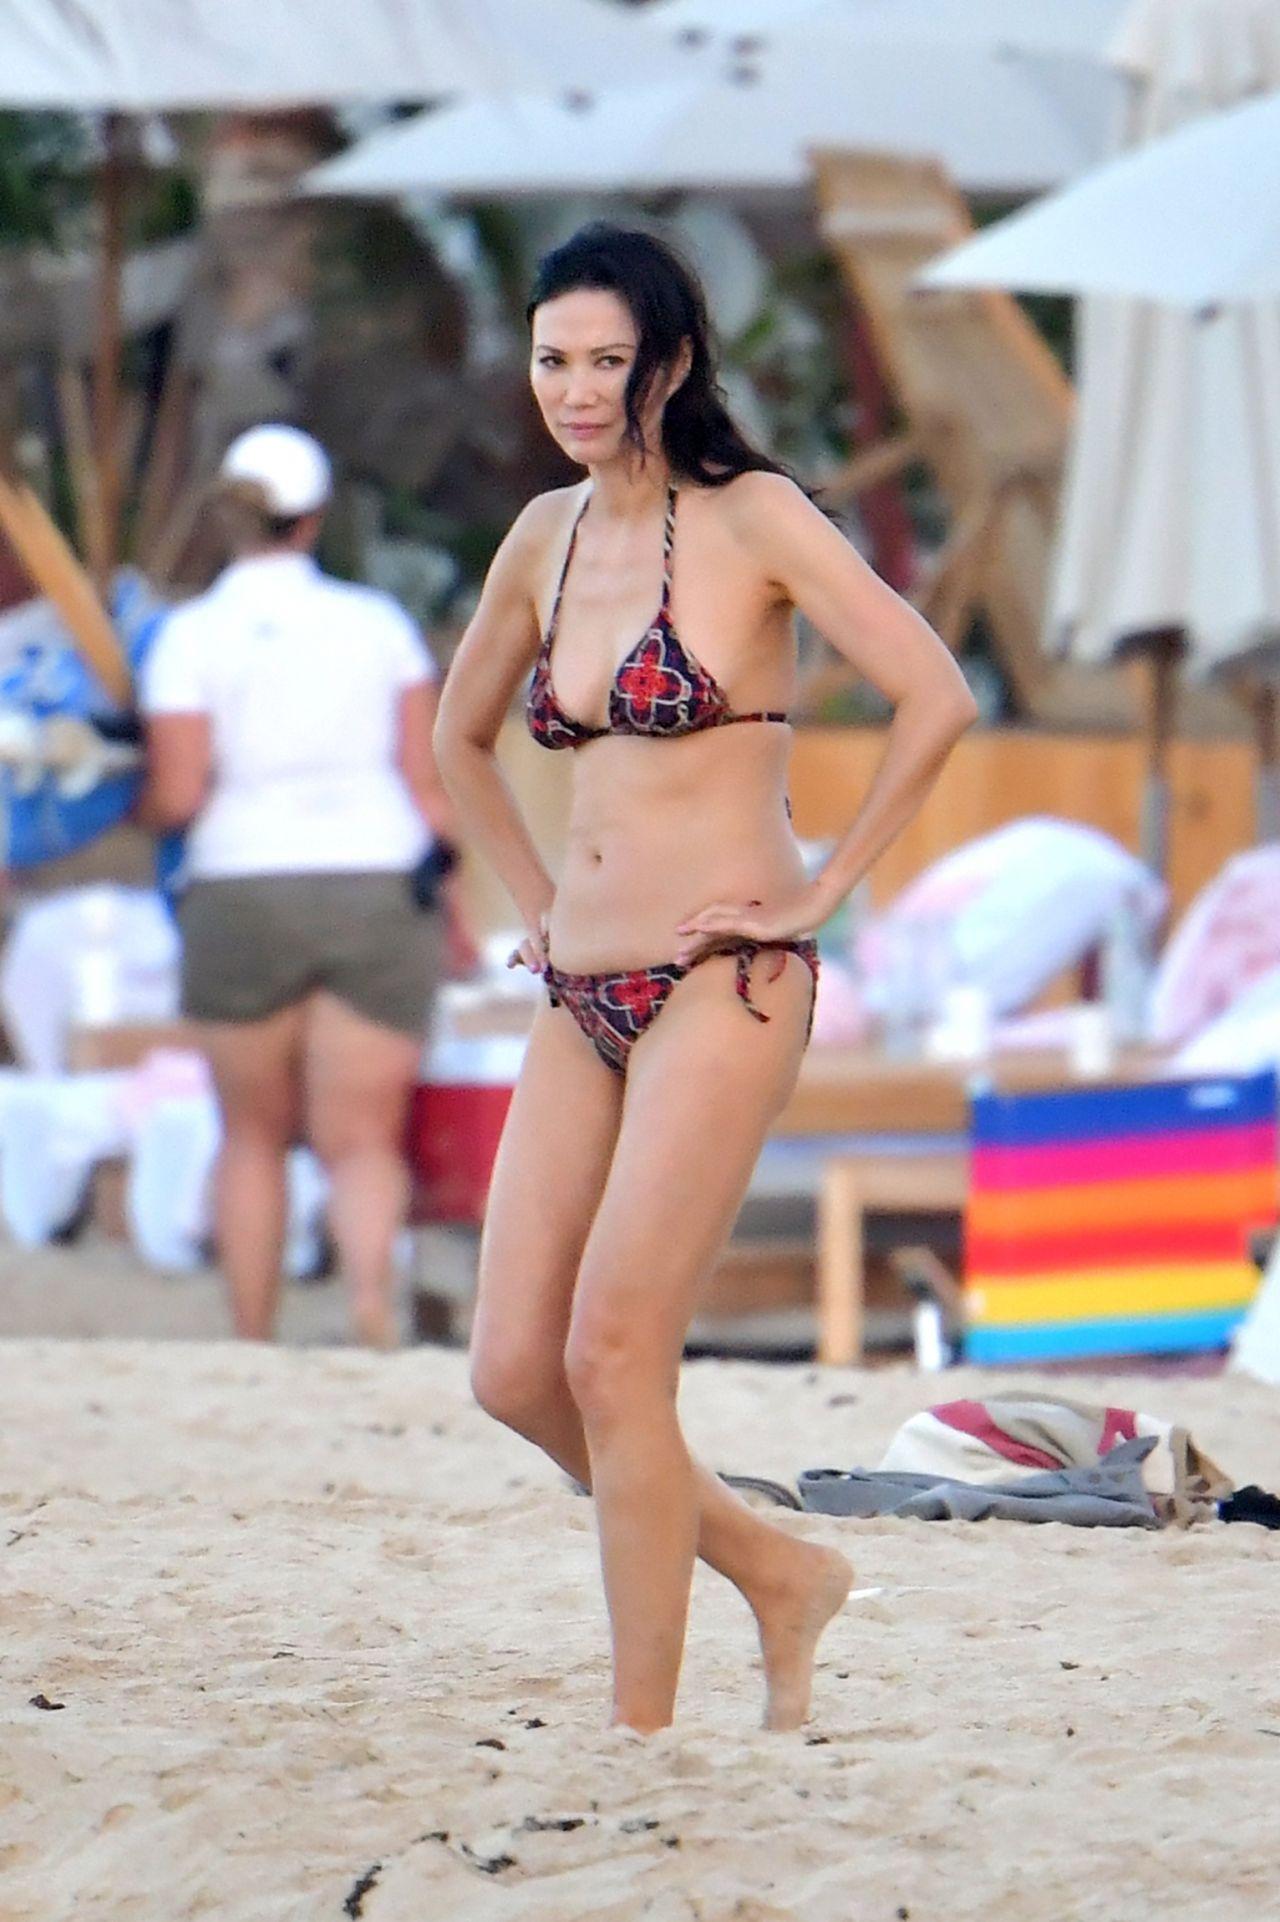 Wendi Deng Murdoch Bikini Nude Photos 83